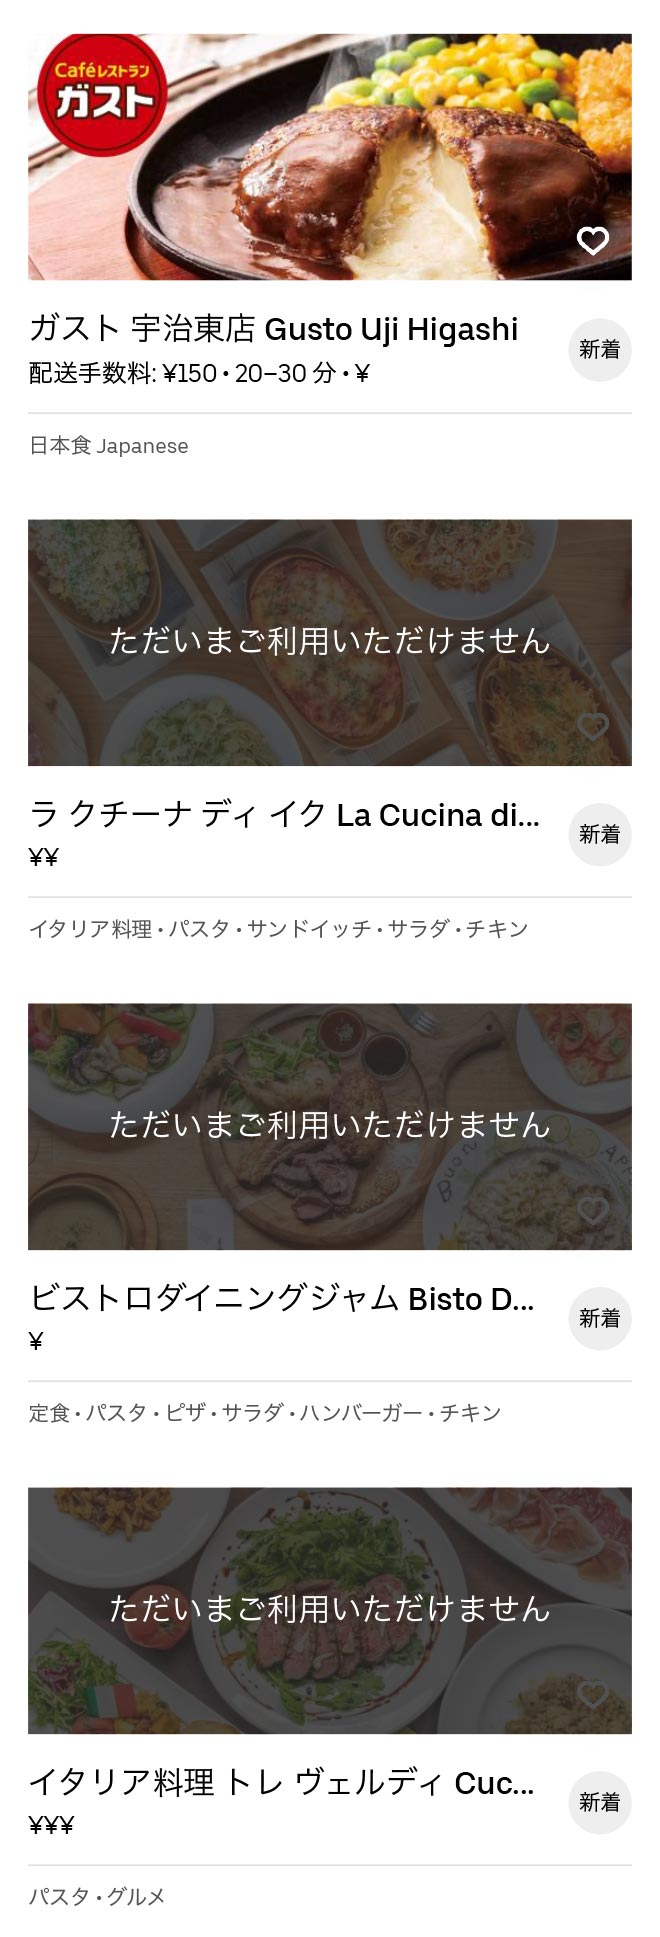 Uji menu 2005 04